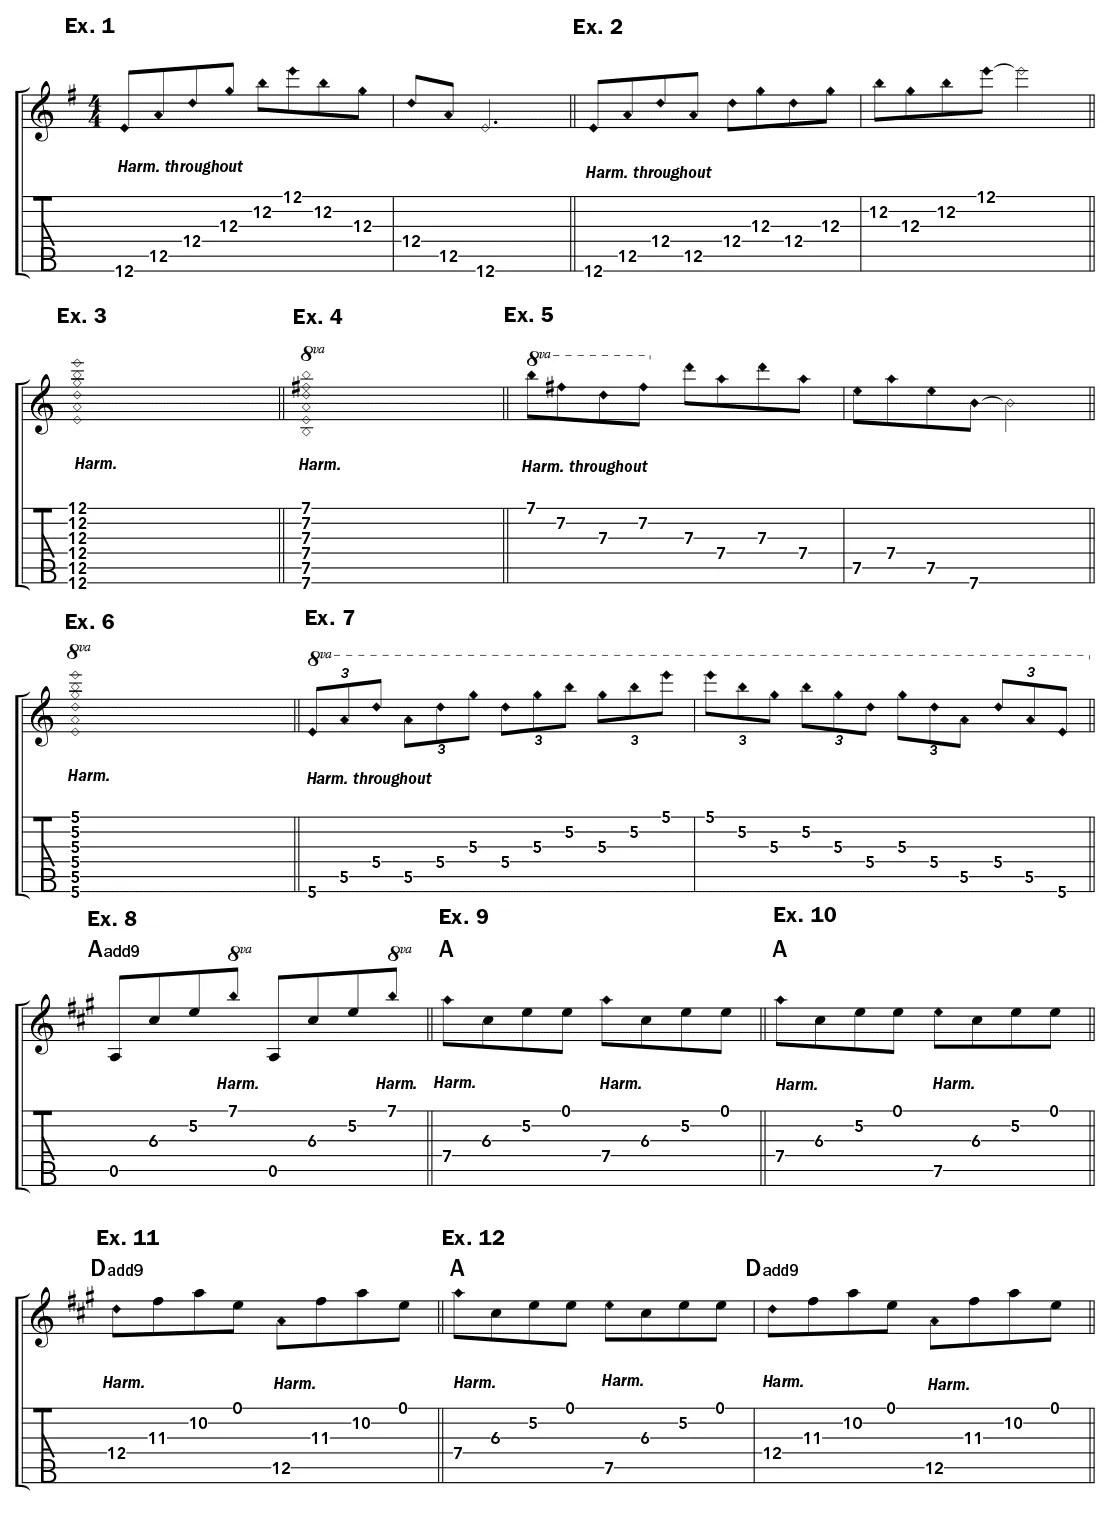 harmonics-lesson